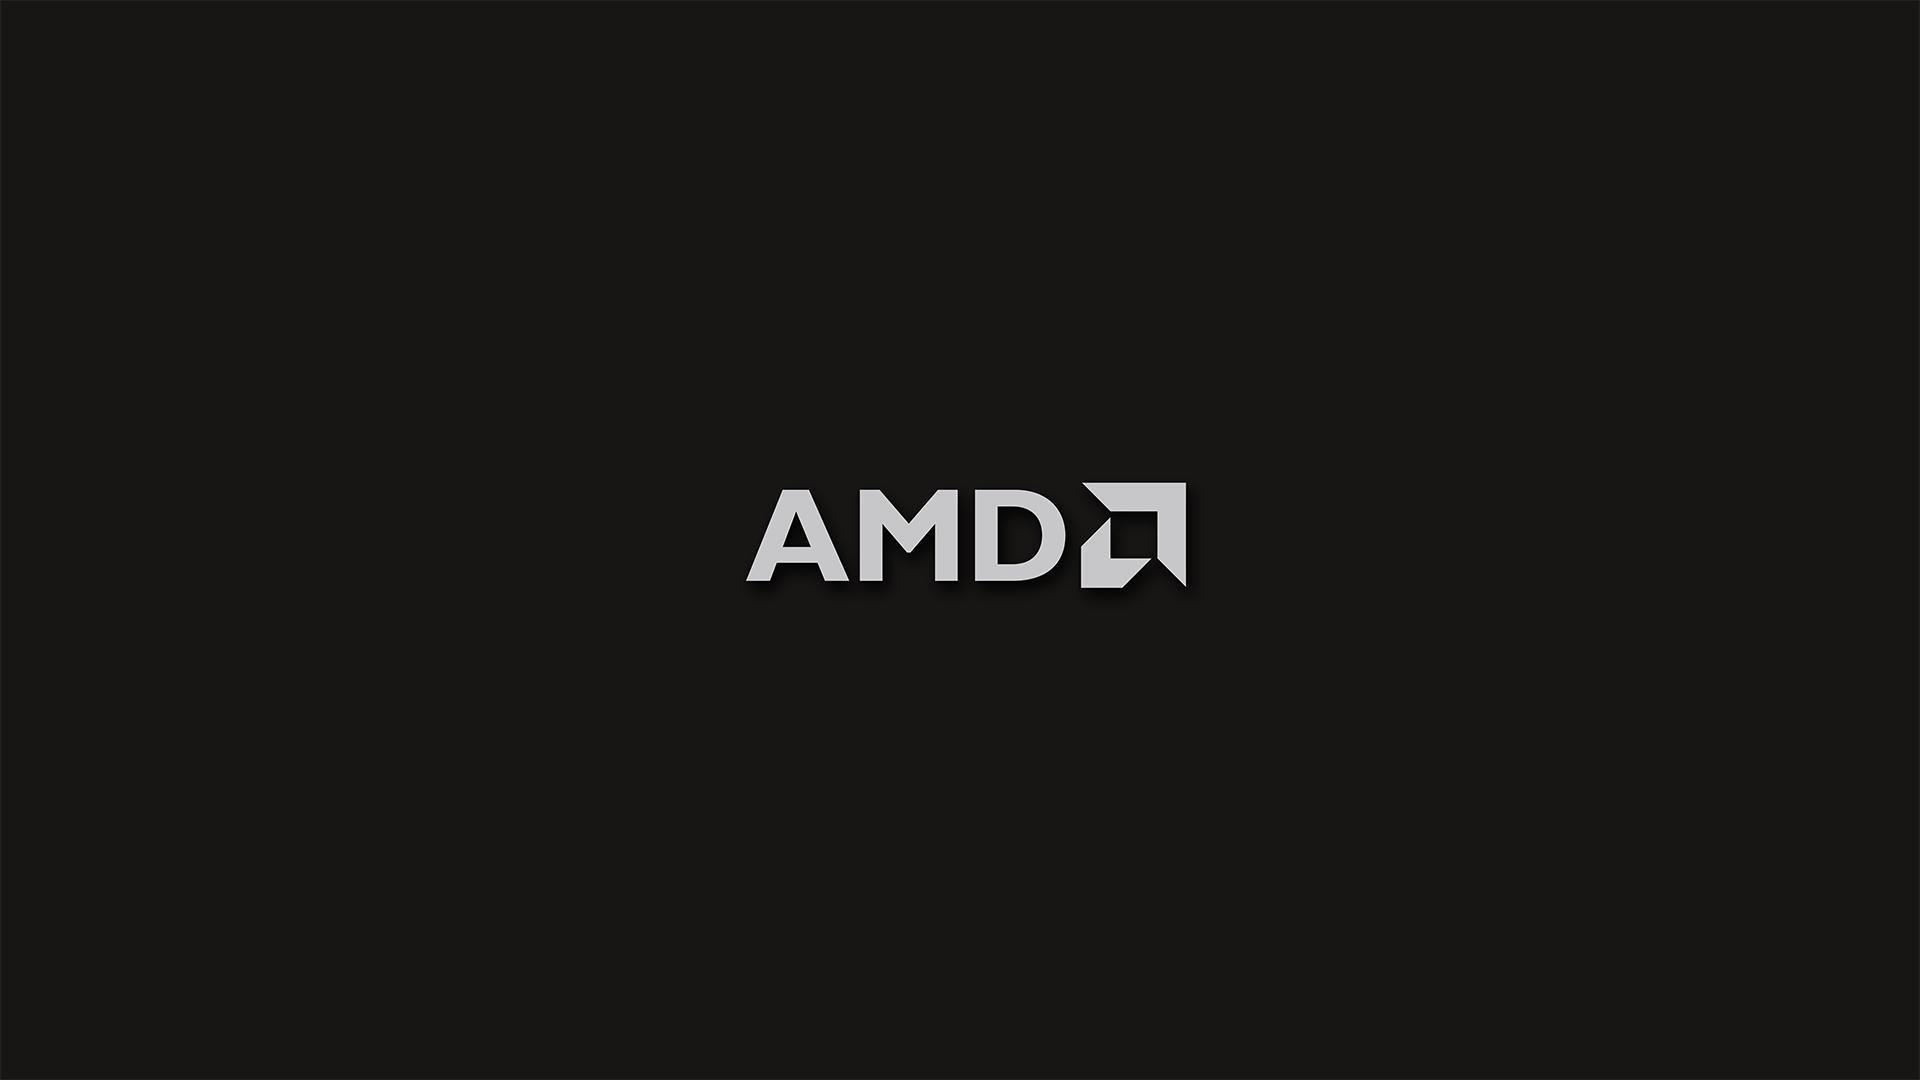 Nvidia Amd Wallpapers 8k 4k 1440p 1080p Pcmasterrace